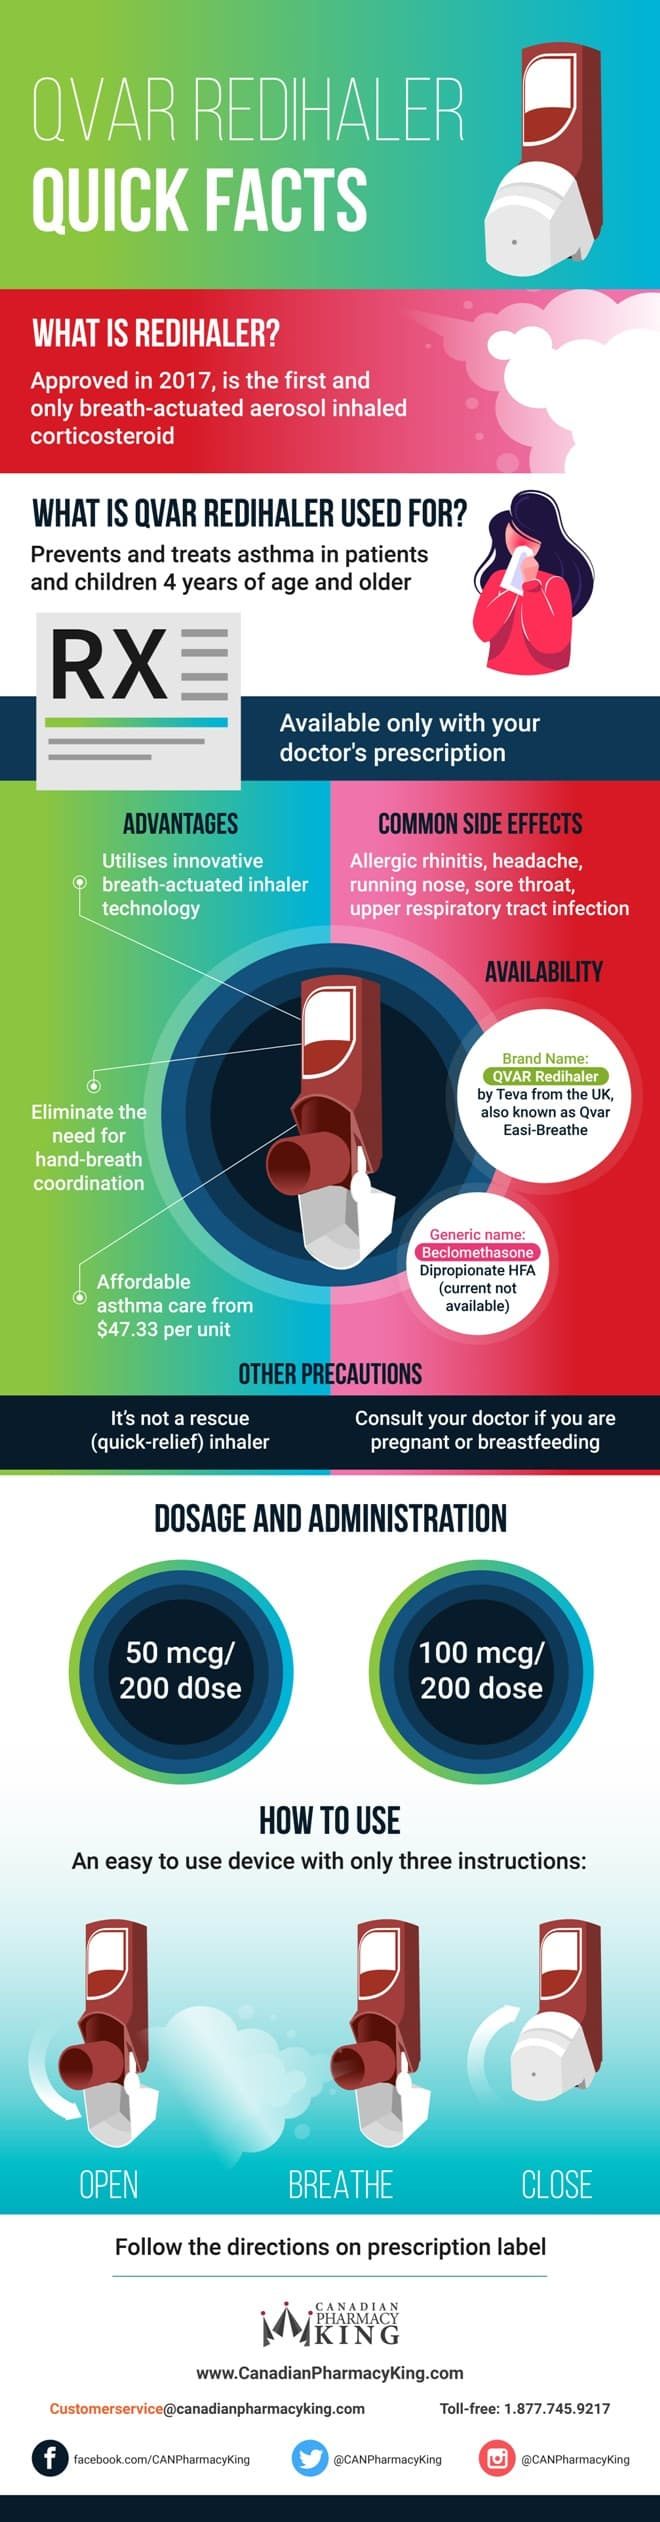 Qvar Redihaler Quick Facts Infographic